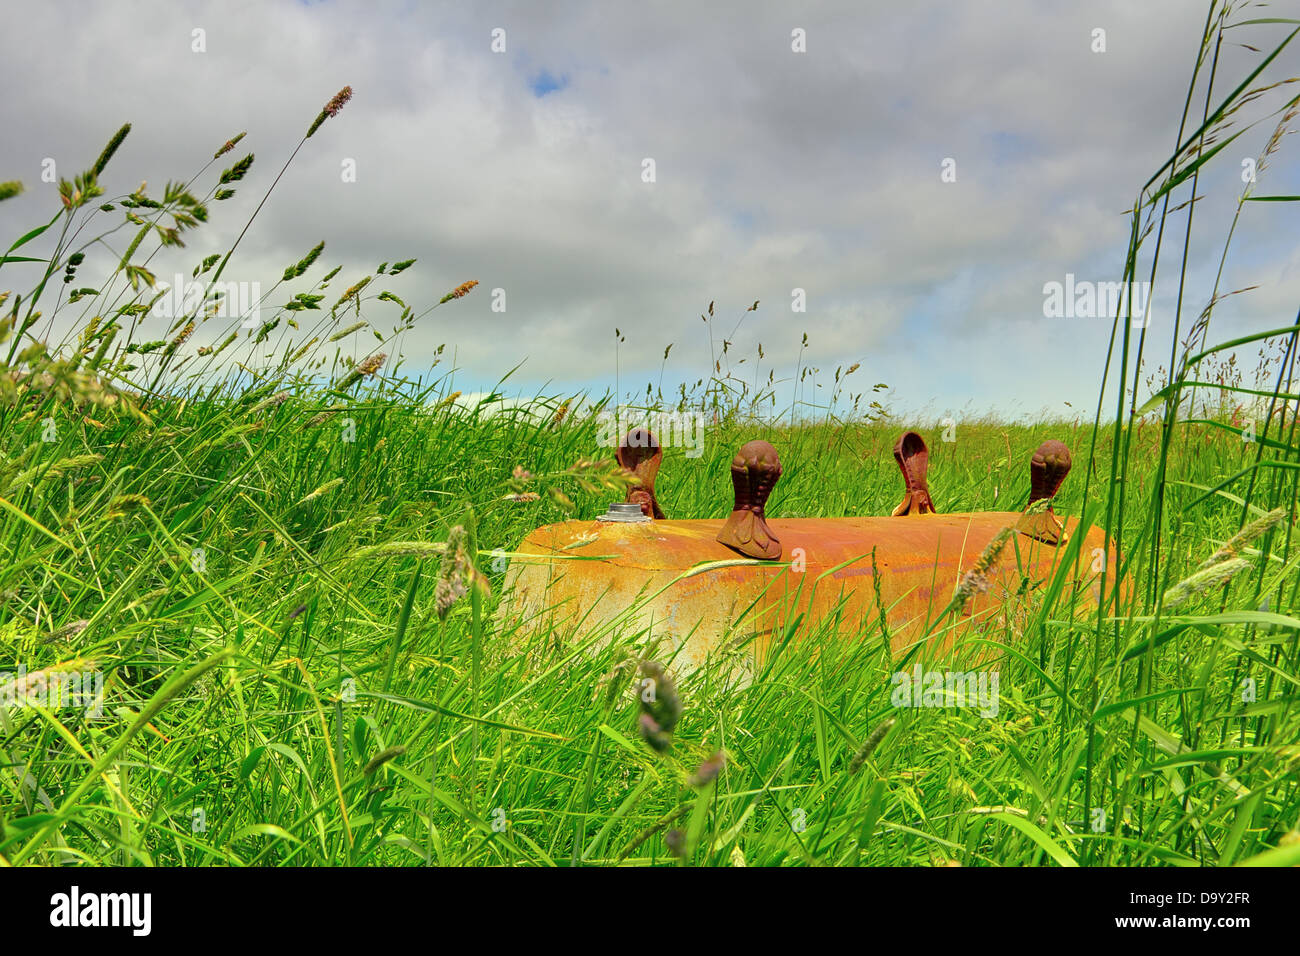 Vasca Da Bagno Arrugginita : Capovolta vecchio arrugginito vasca da bagno in un campo foto